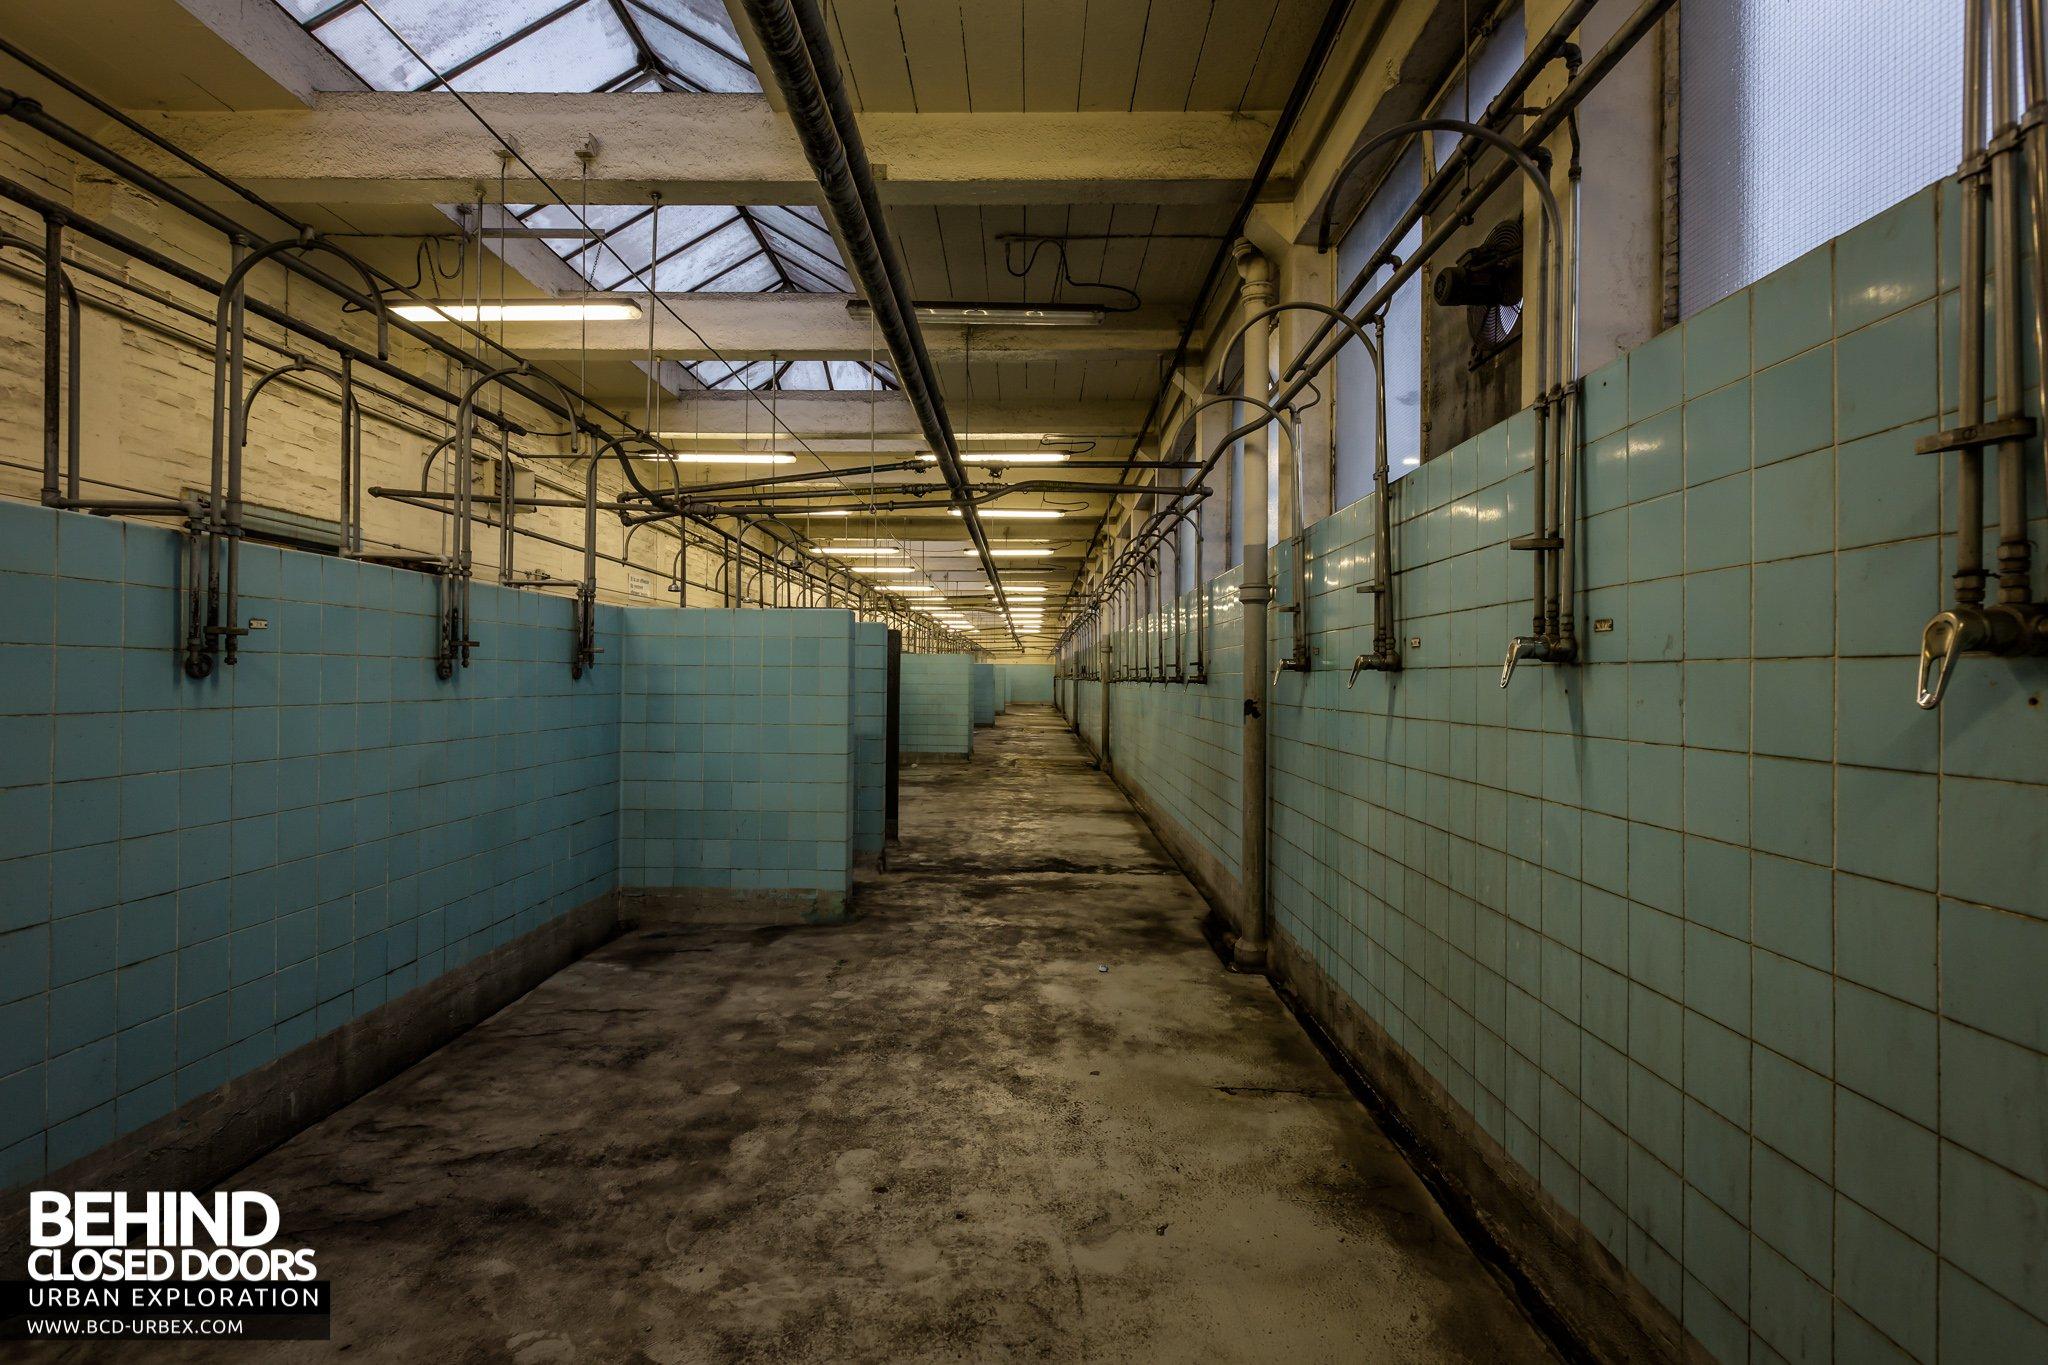 Kellingley Colliery Yorkshire Uk 187 Urbex Behind Closed